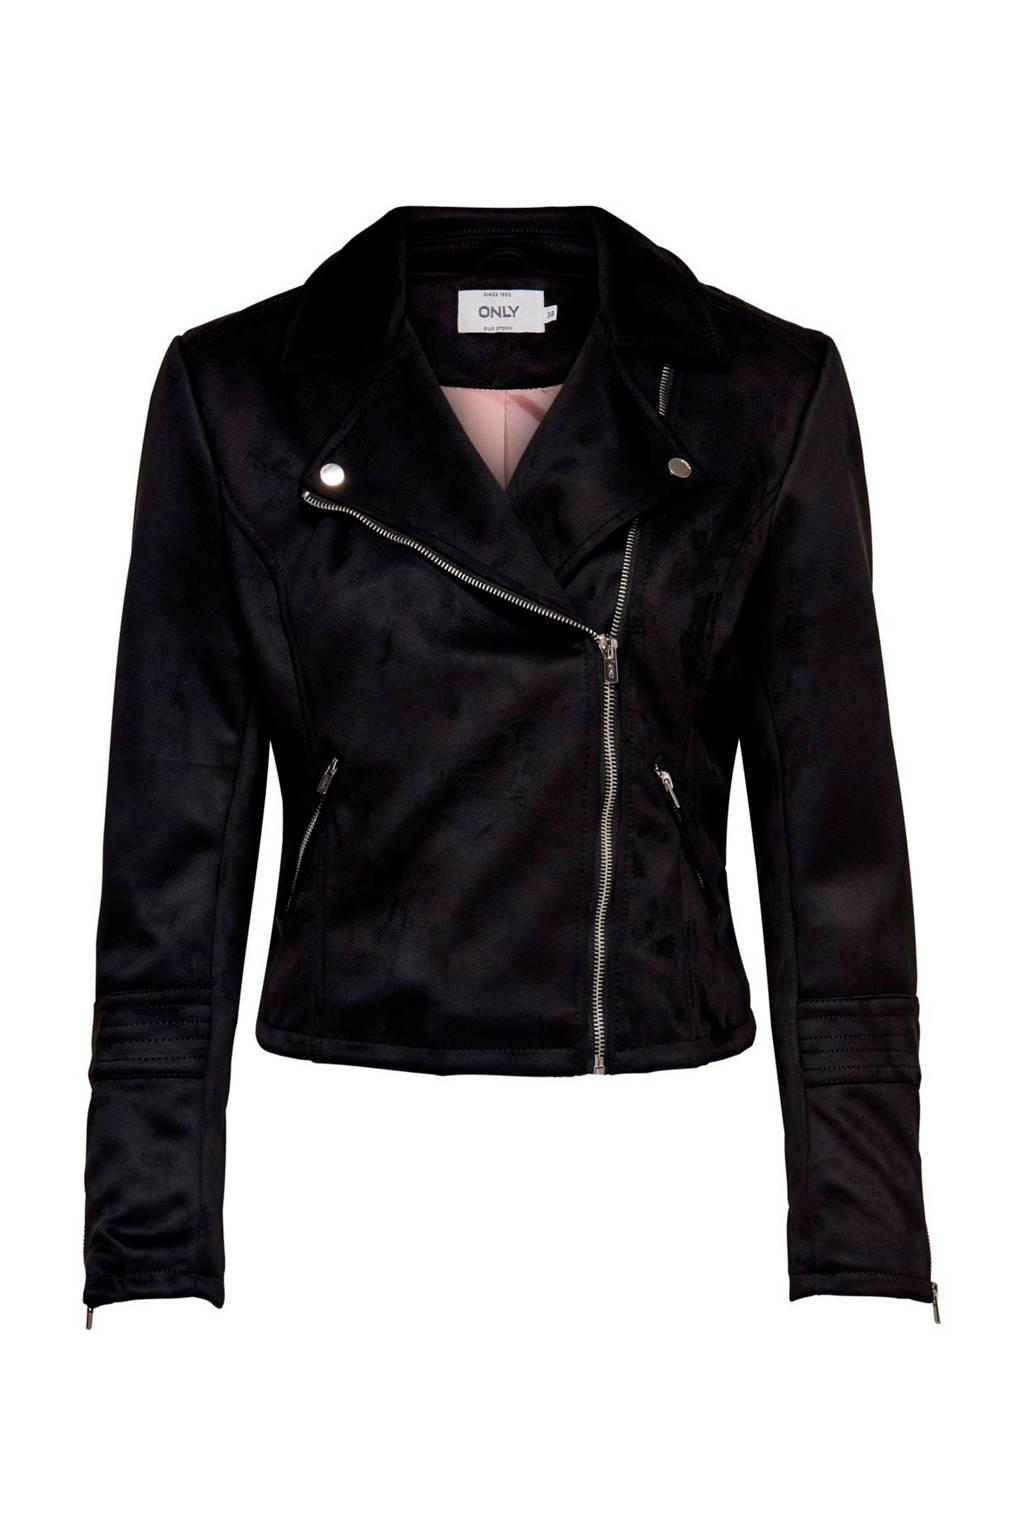 ONLY bikerjack zwart, Zwart